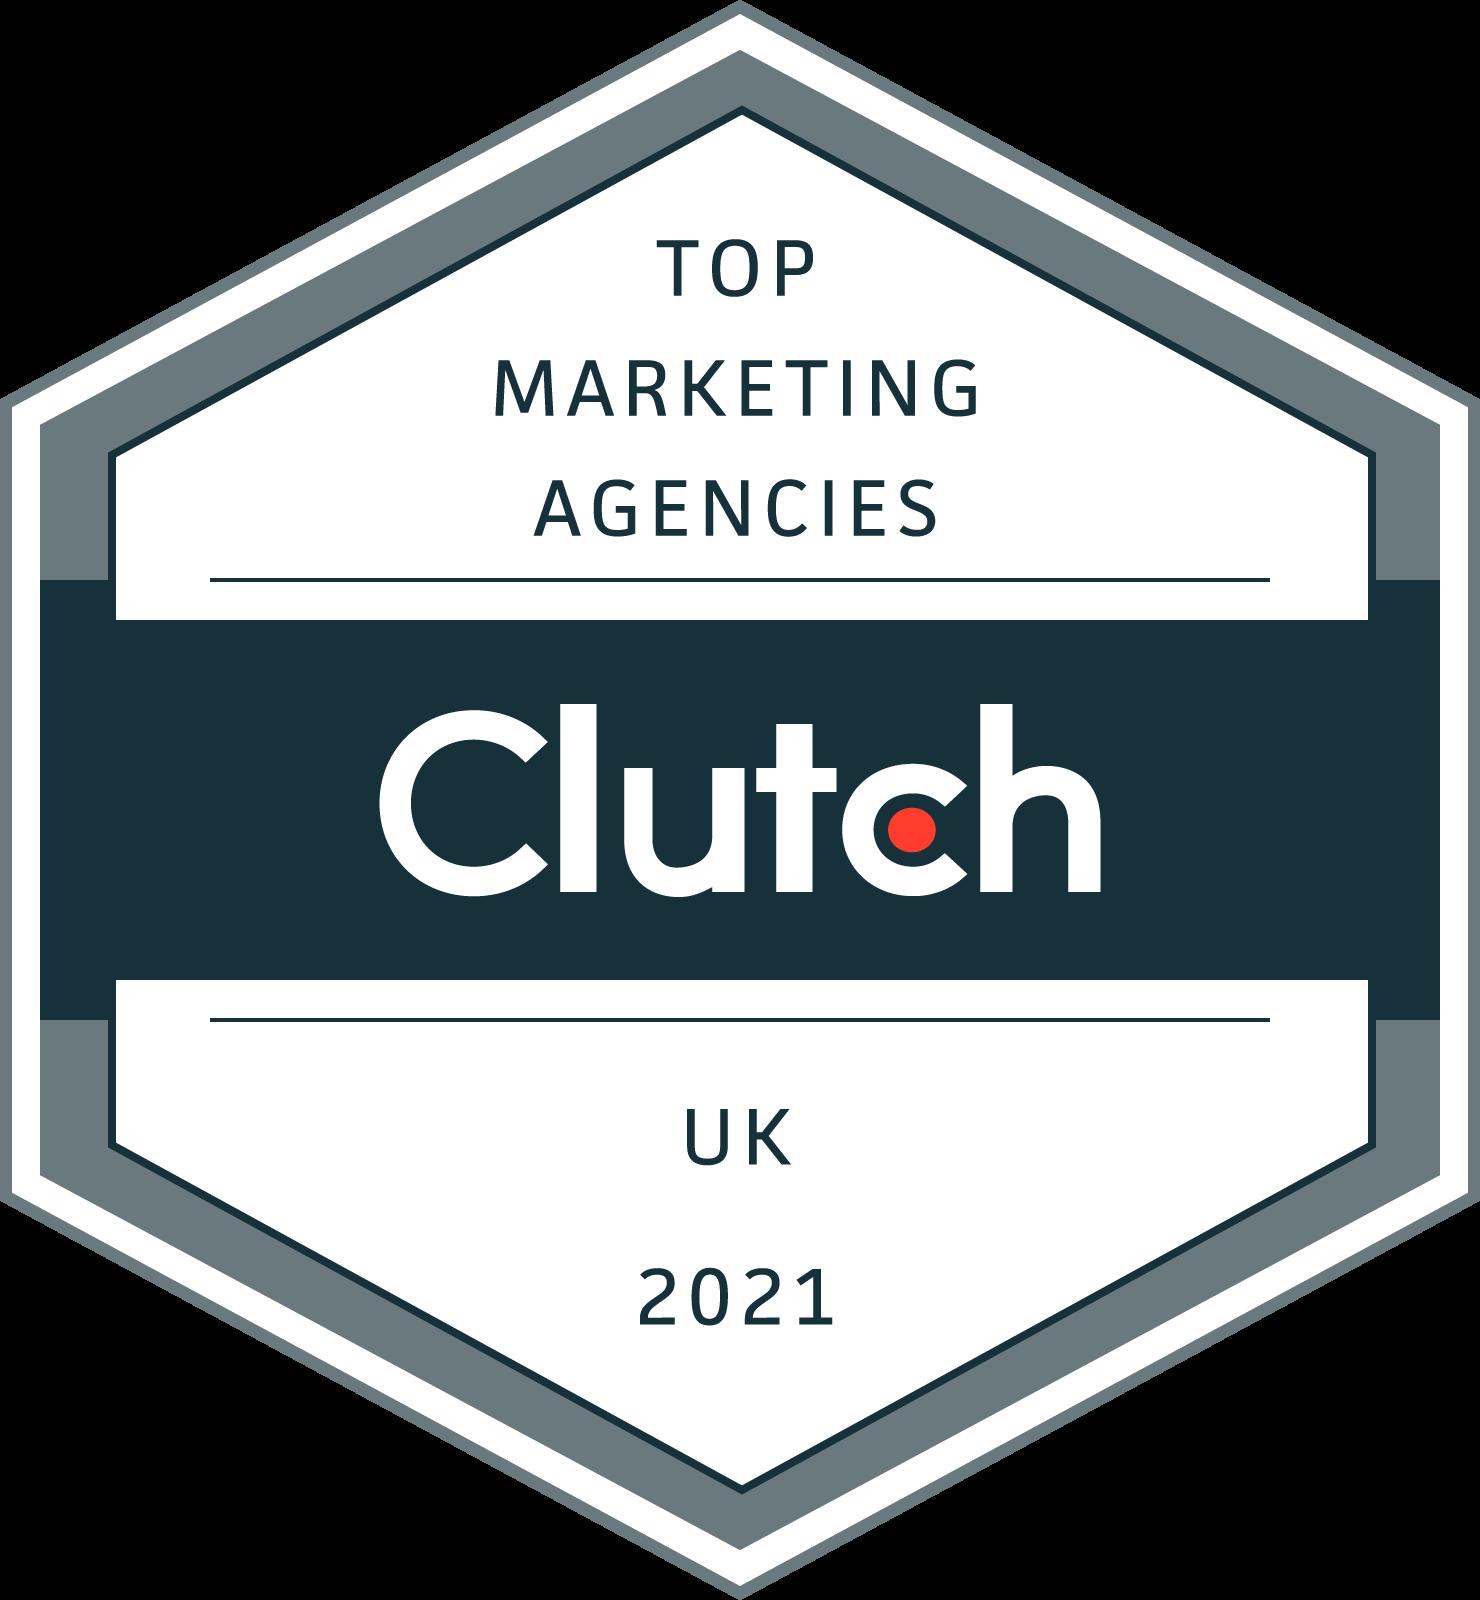 Top Marketing Agencies Award 2021 Clutch For Elevate Digital